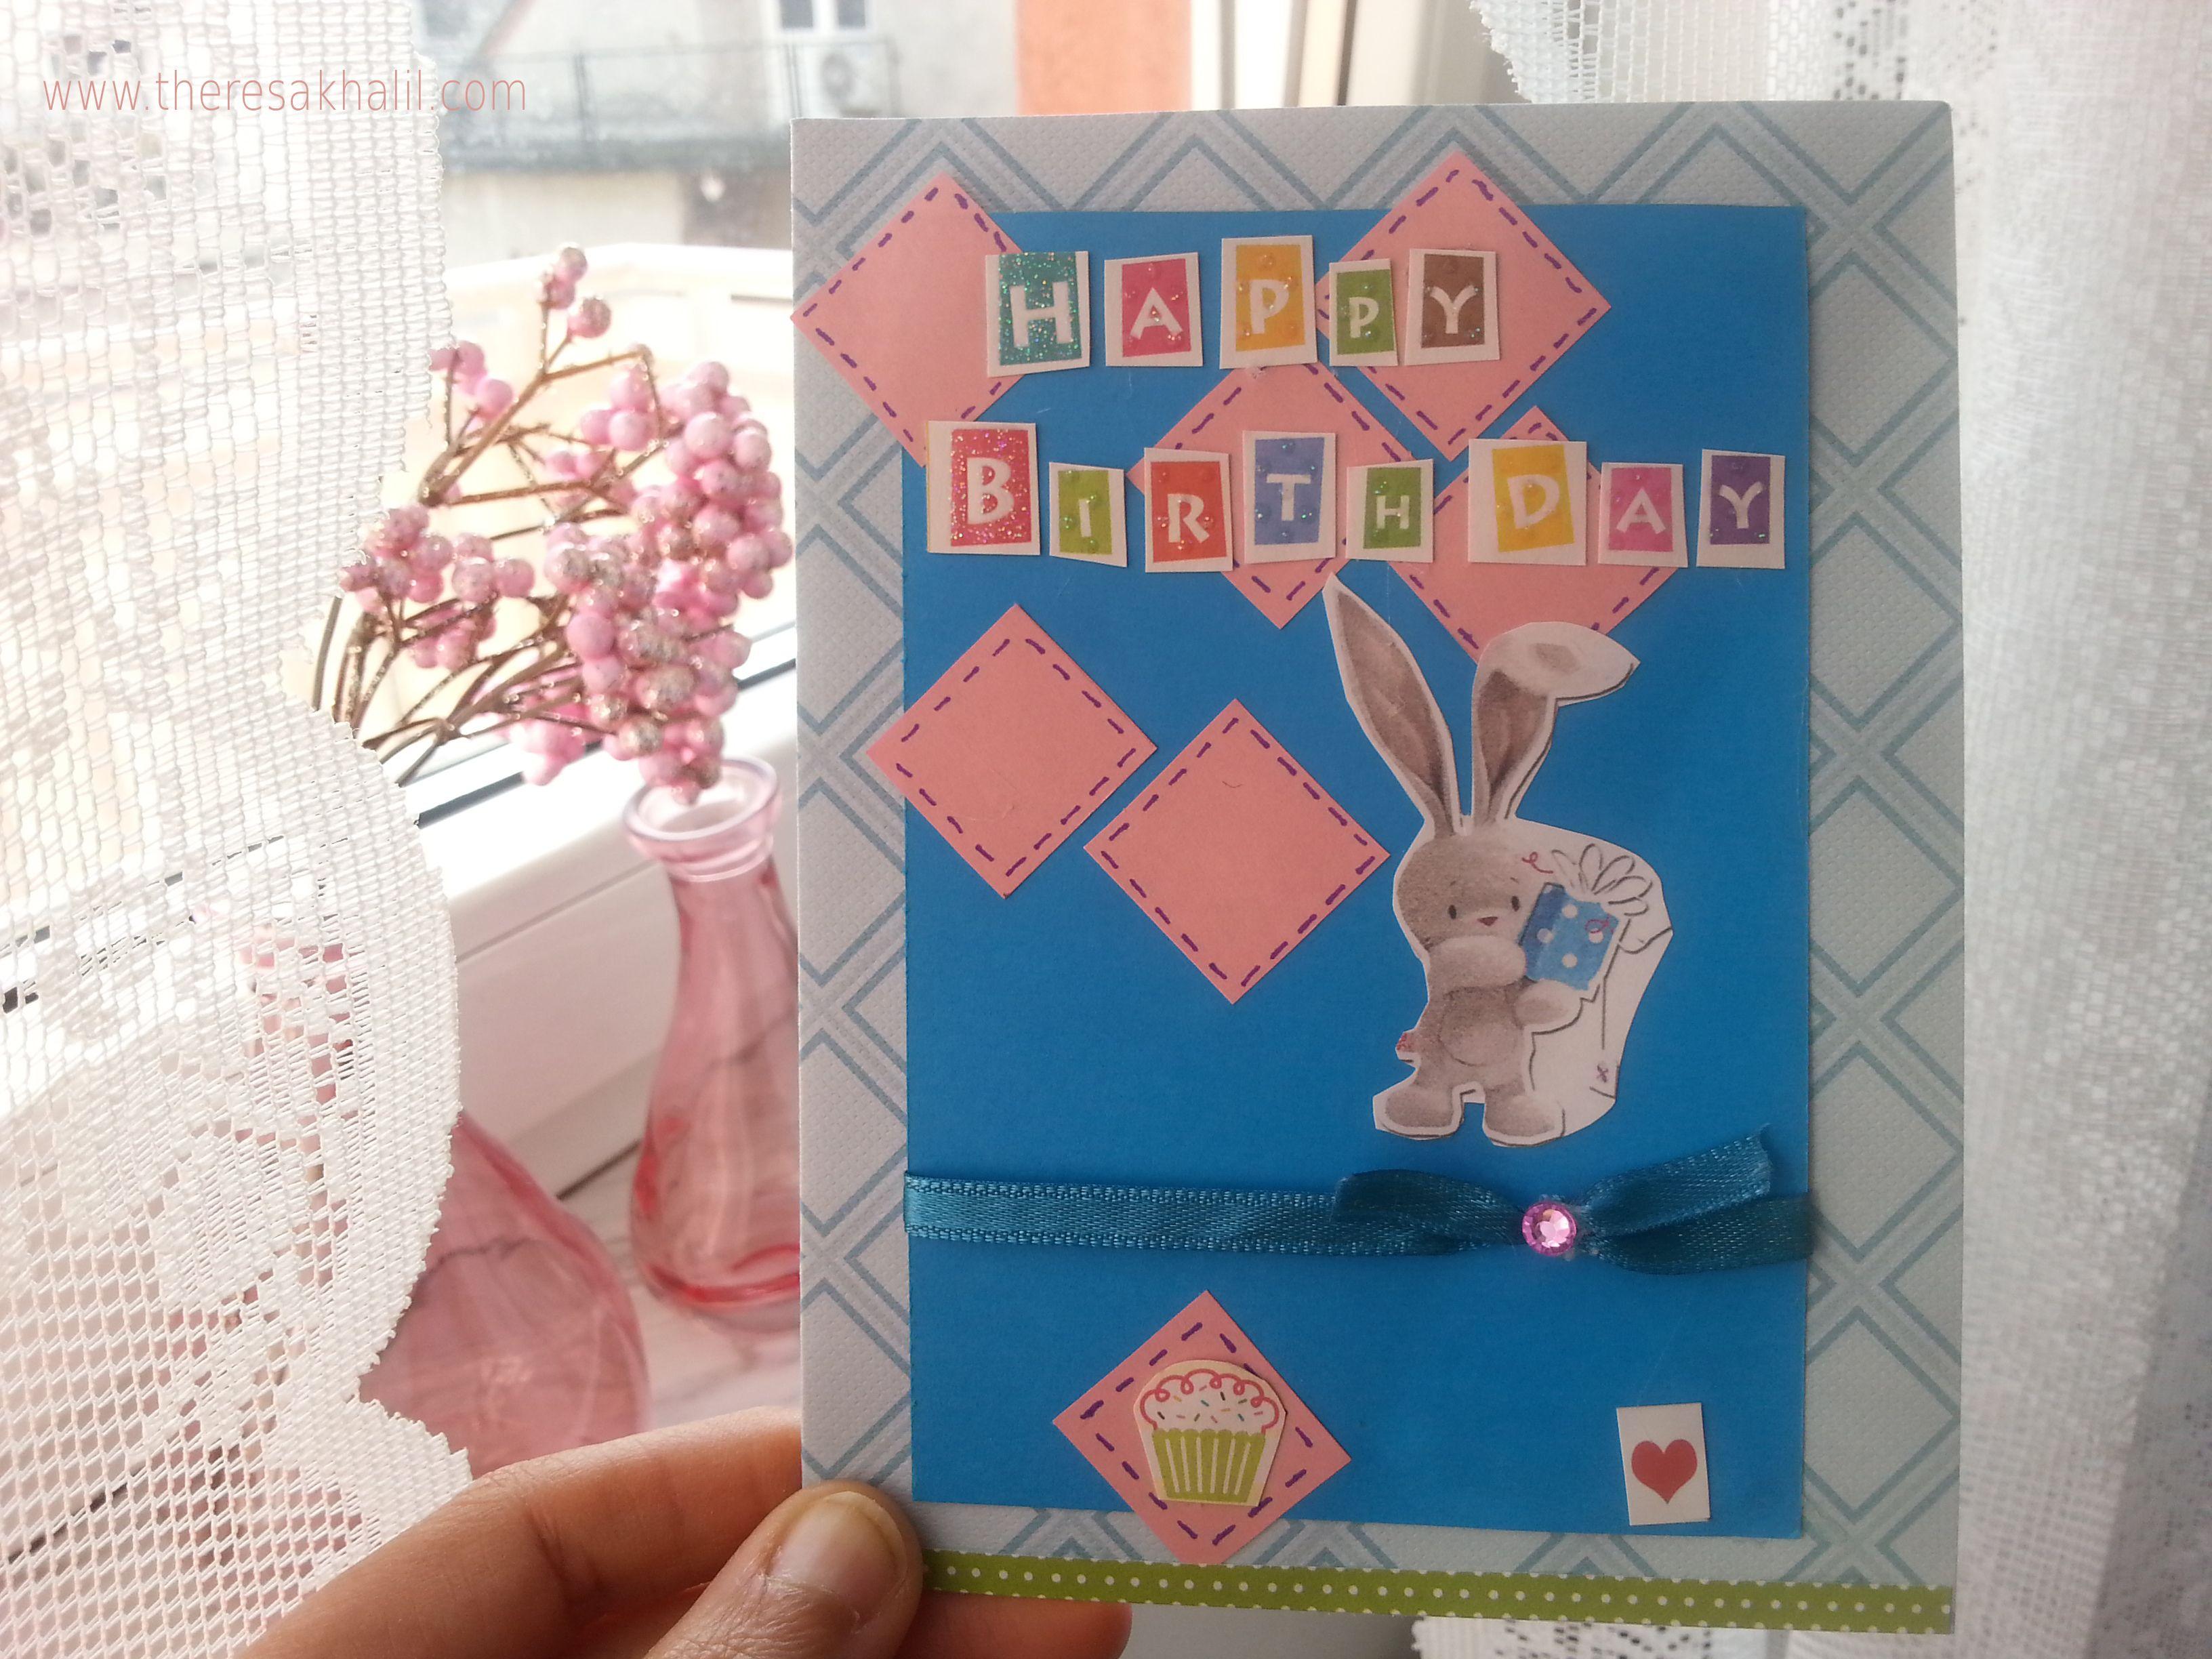 كرت عيد ميلاد هاند ميد Handmadecards هاندميد كرت كرت عيد ميلاد Office Supplies Supplies